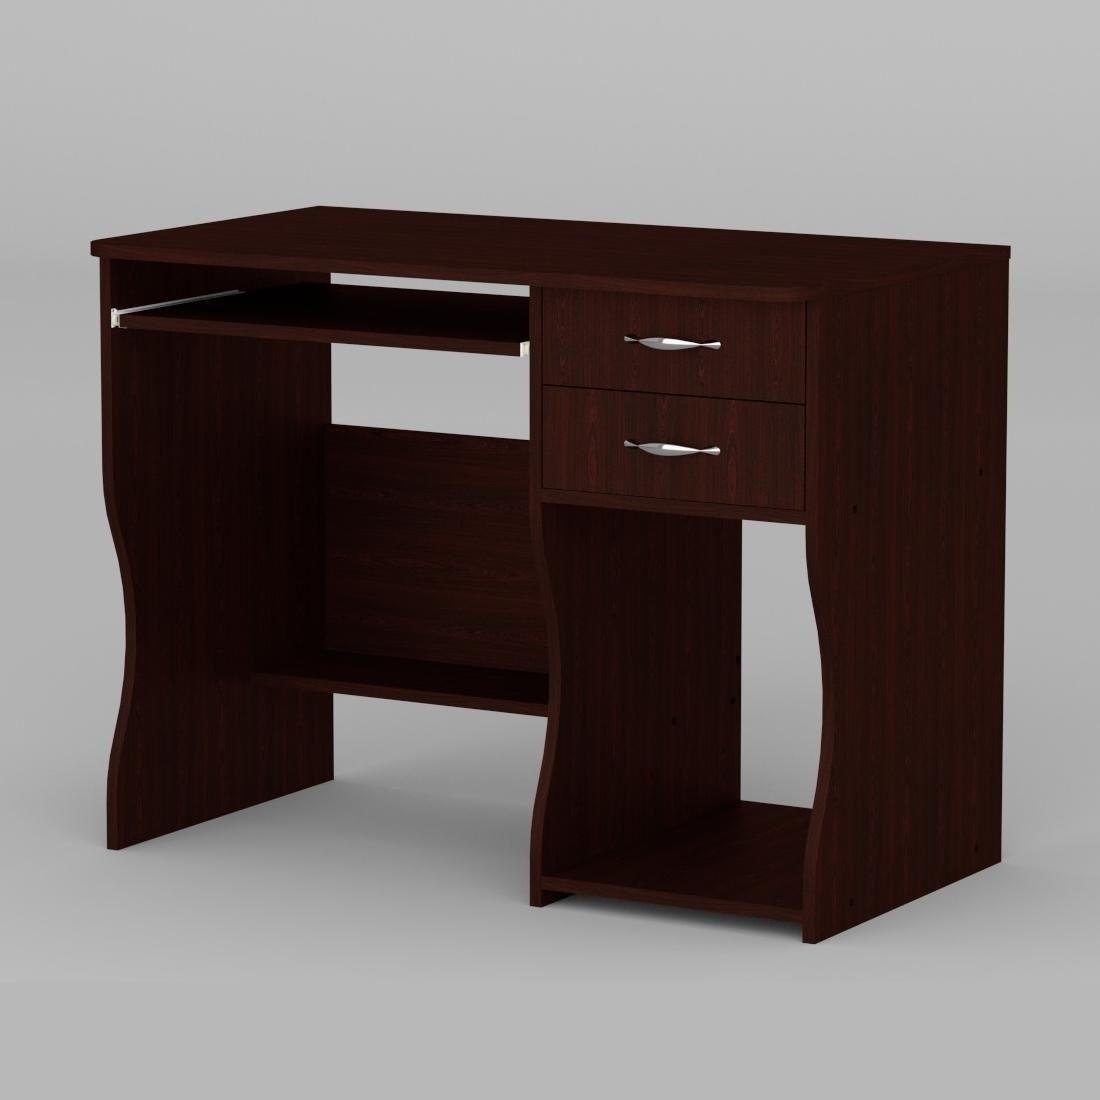 Компьютерный стол Компанит СКМ-7 1000х550х766 мм венге